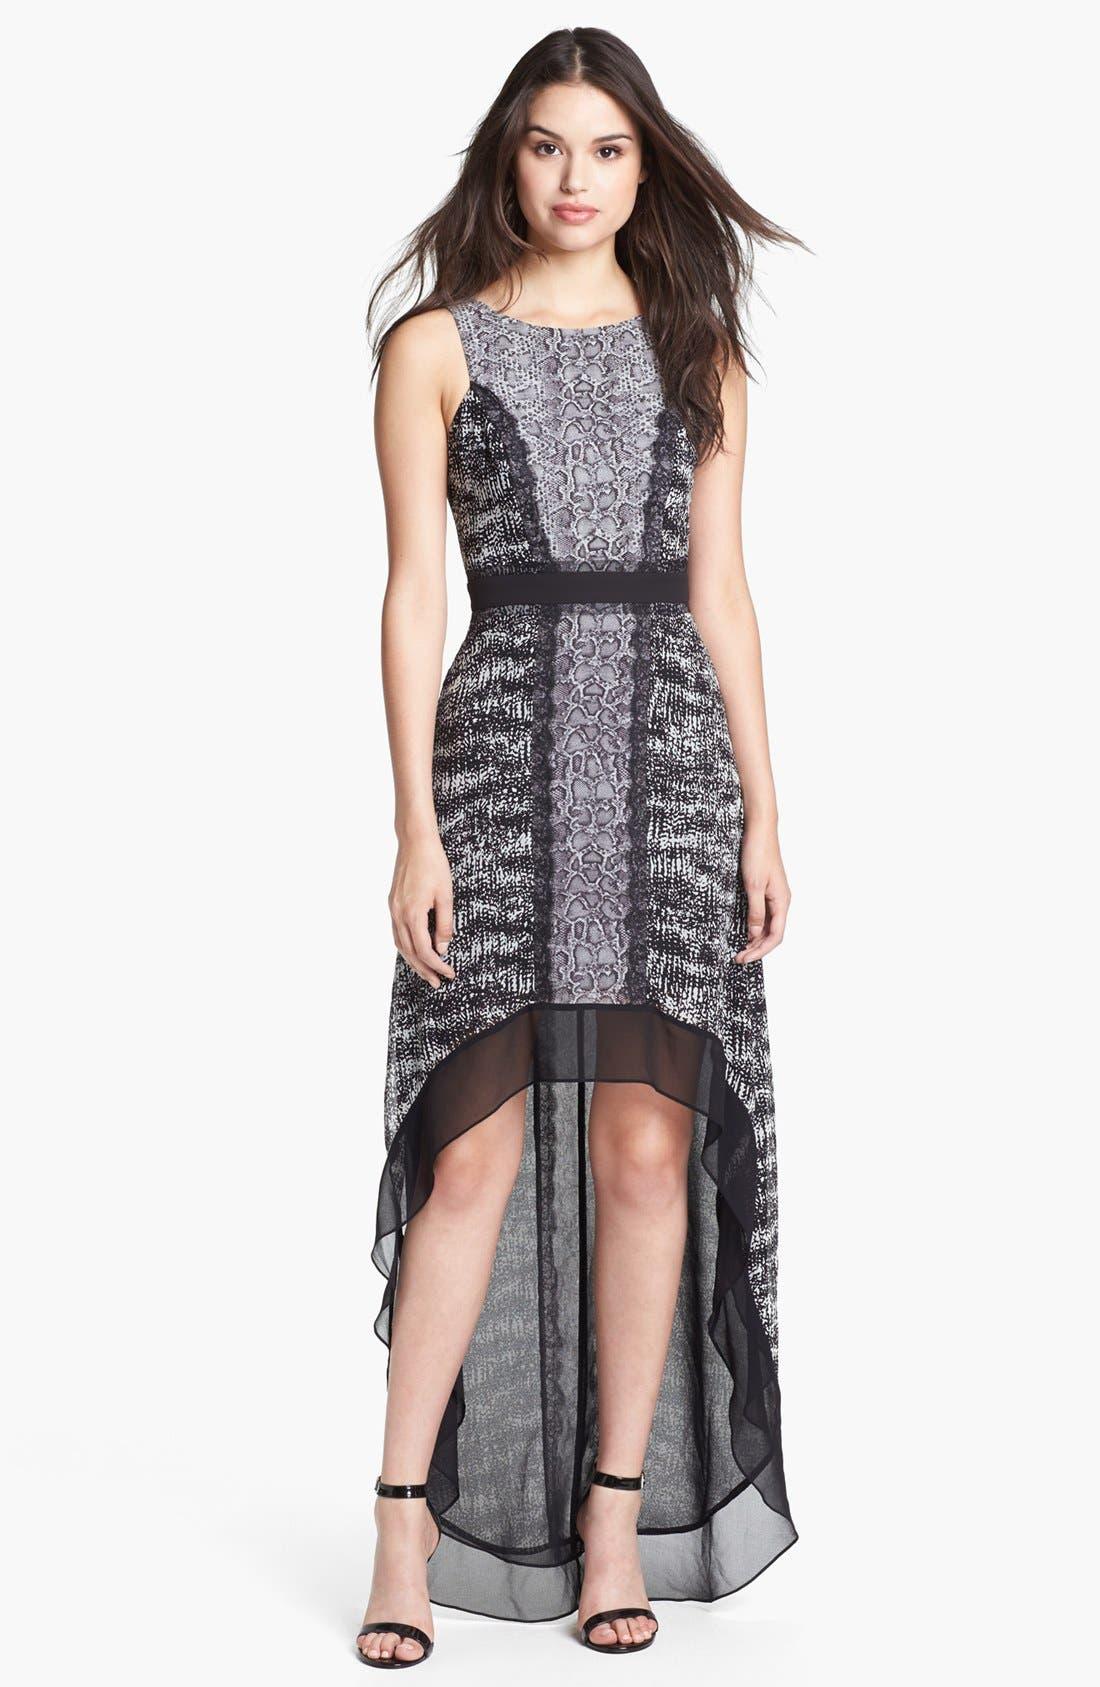 Alternate Image 1 Selected - BCBGMAXAZRIA Mixed Print High/Low Chiffon Dress